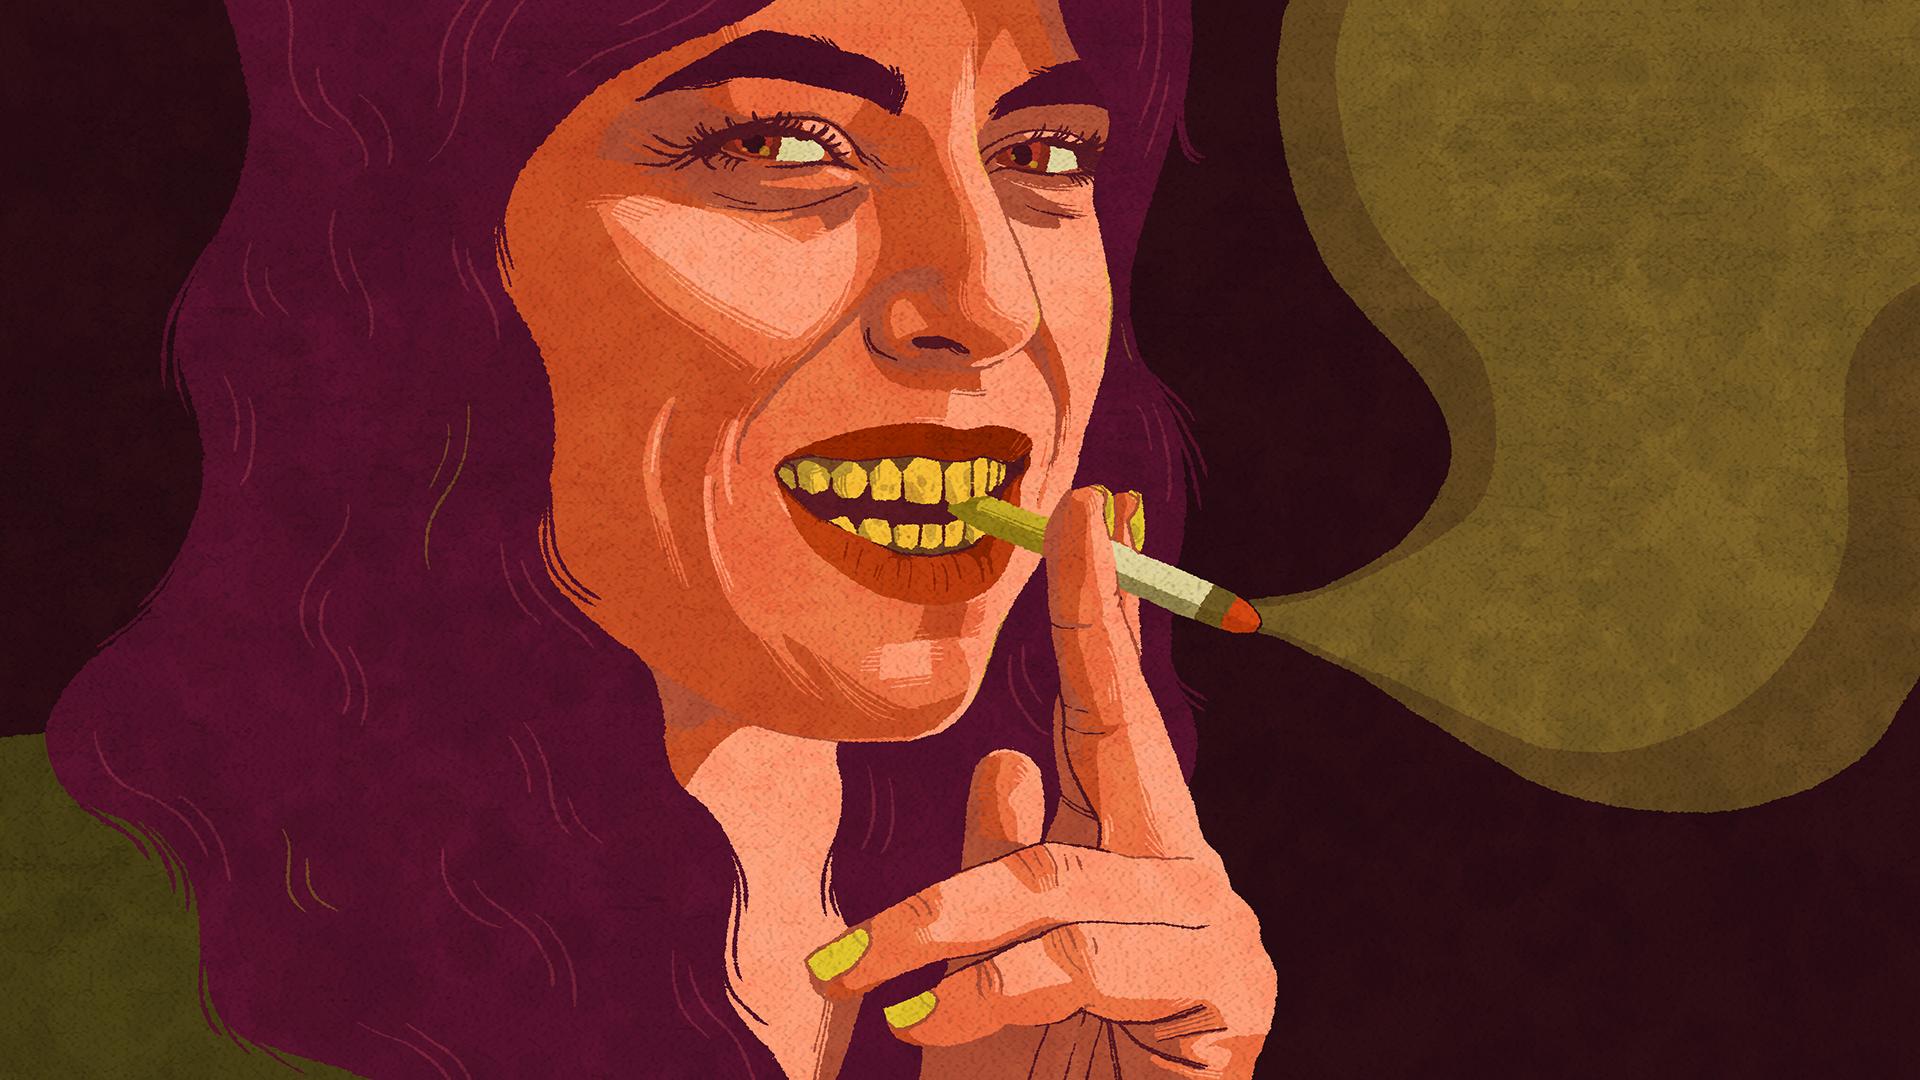 rebecca-hendin-vice-smoking-illustration